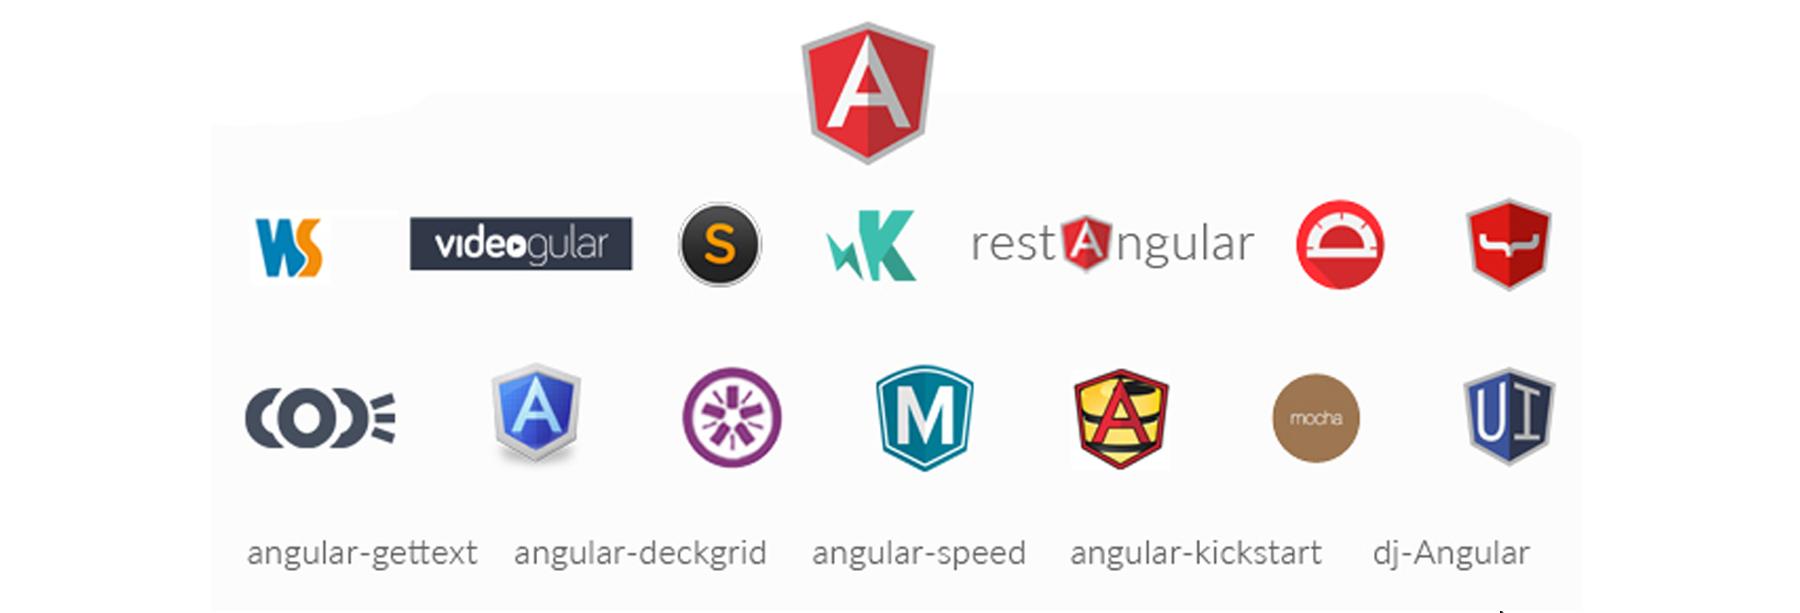 20-best-angular-development-tools-for-developers